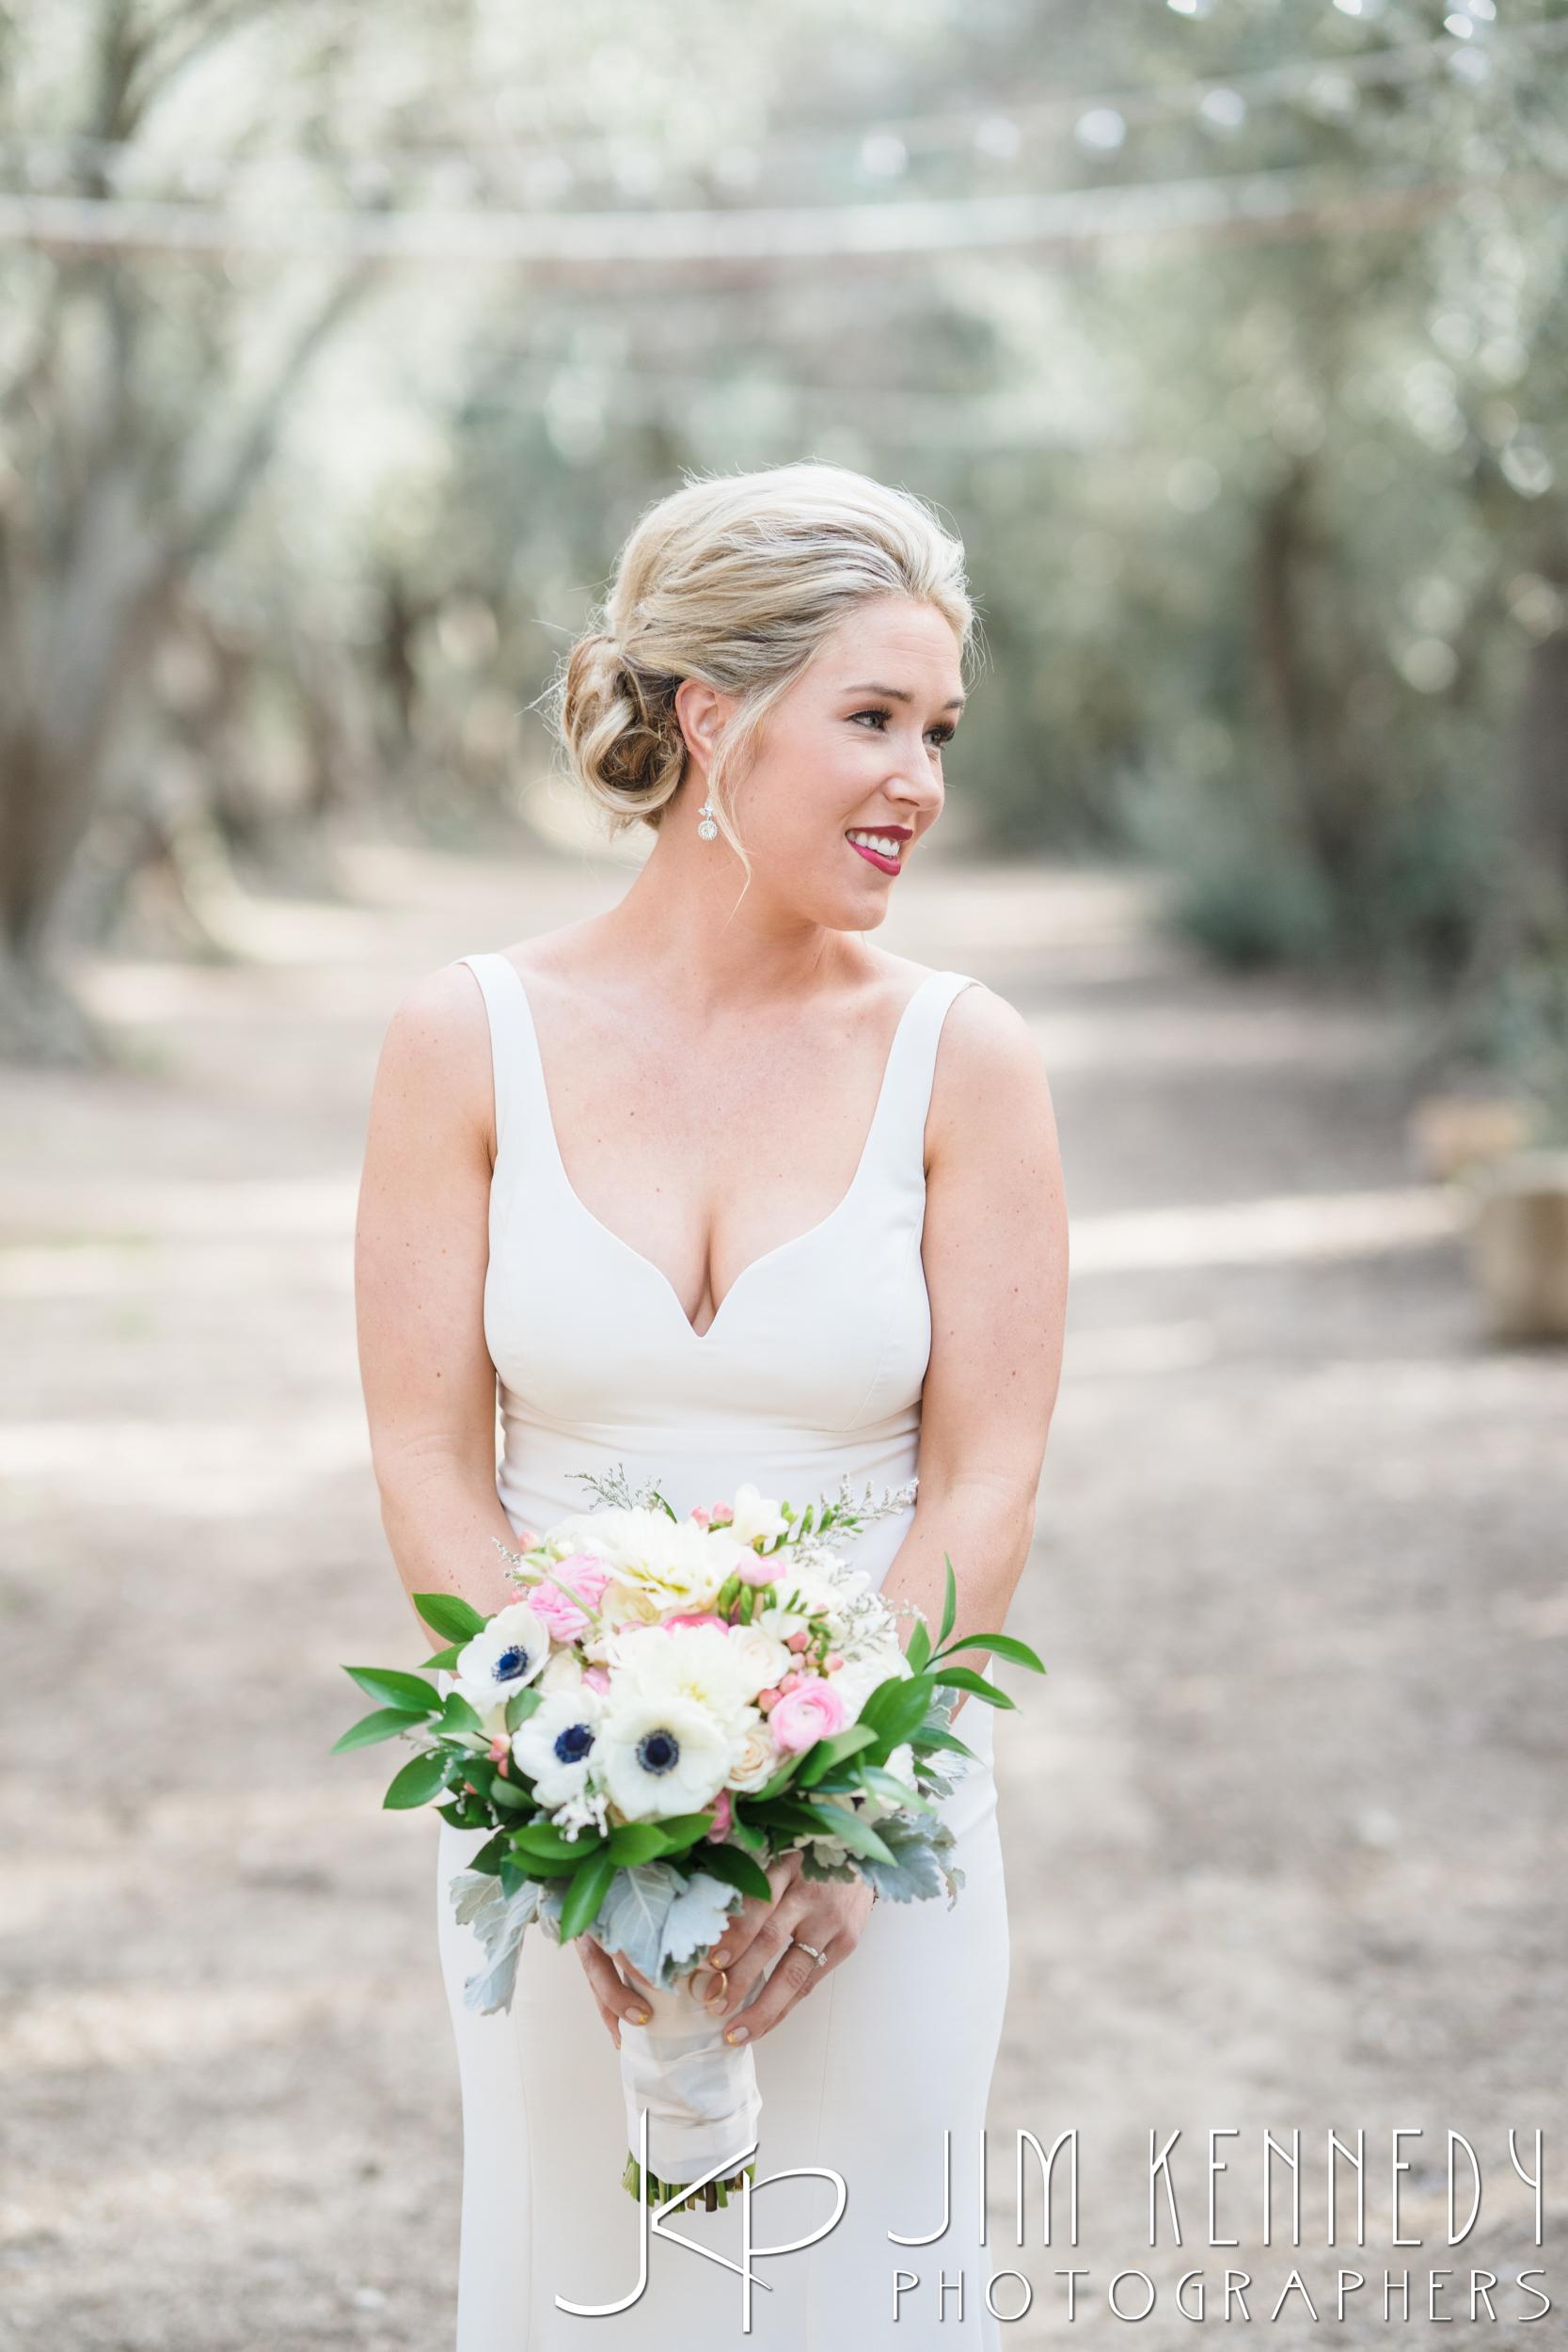 jim_kennedy_photographers_highland_springs_wedding_caitlyn_0055.jpg